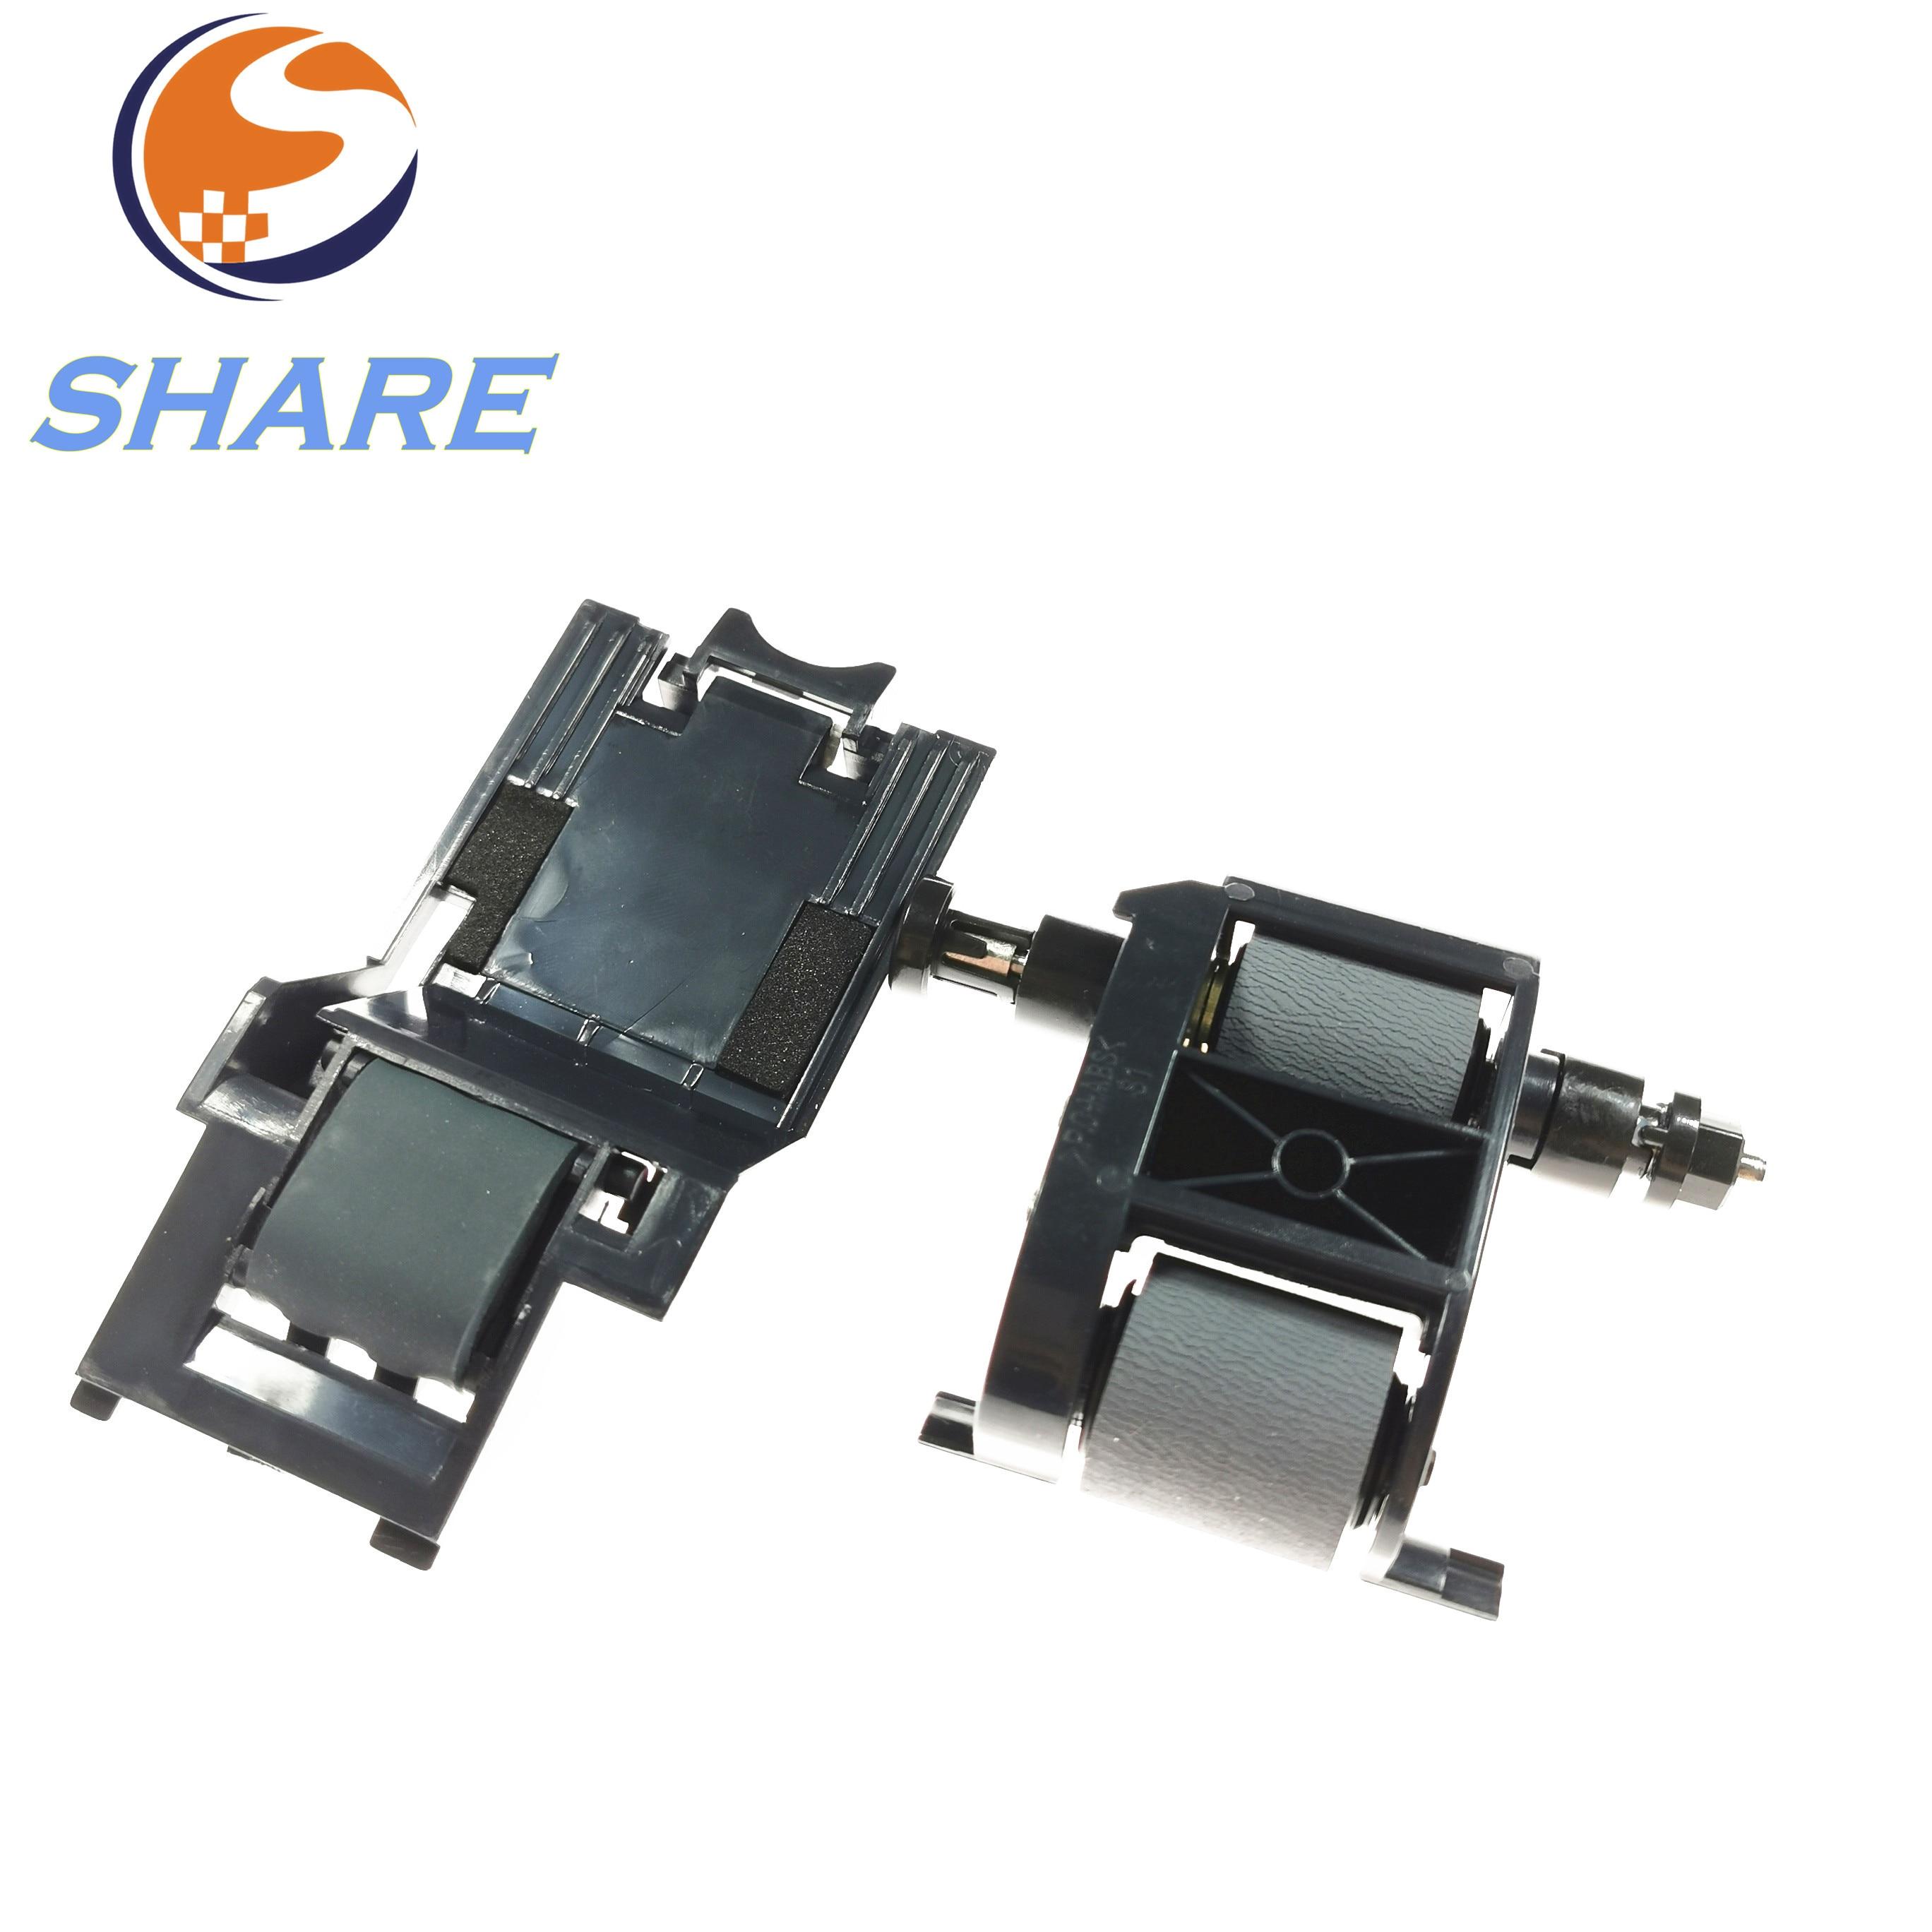 Compartir L2718A ADF Kit para HP M575 M680 M630 M525 M725 651 M775 L2725-60002 ScanJet 7500 Series